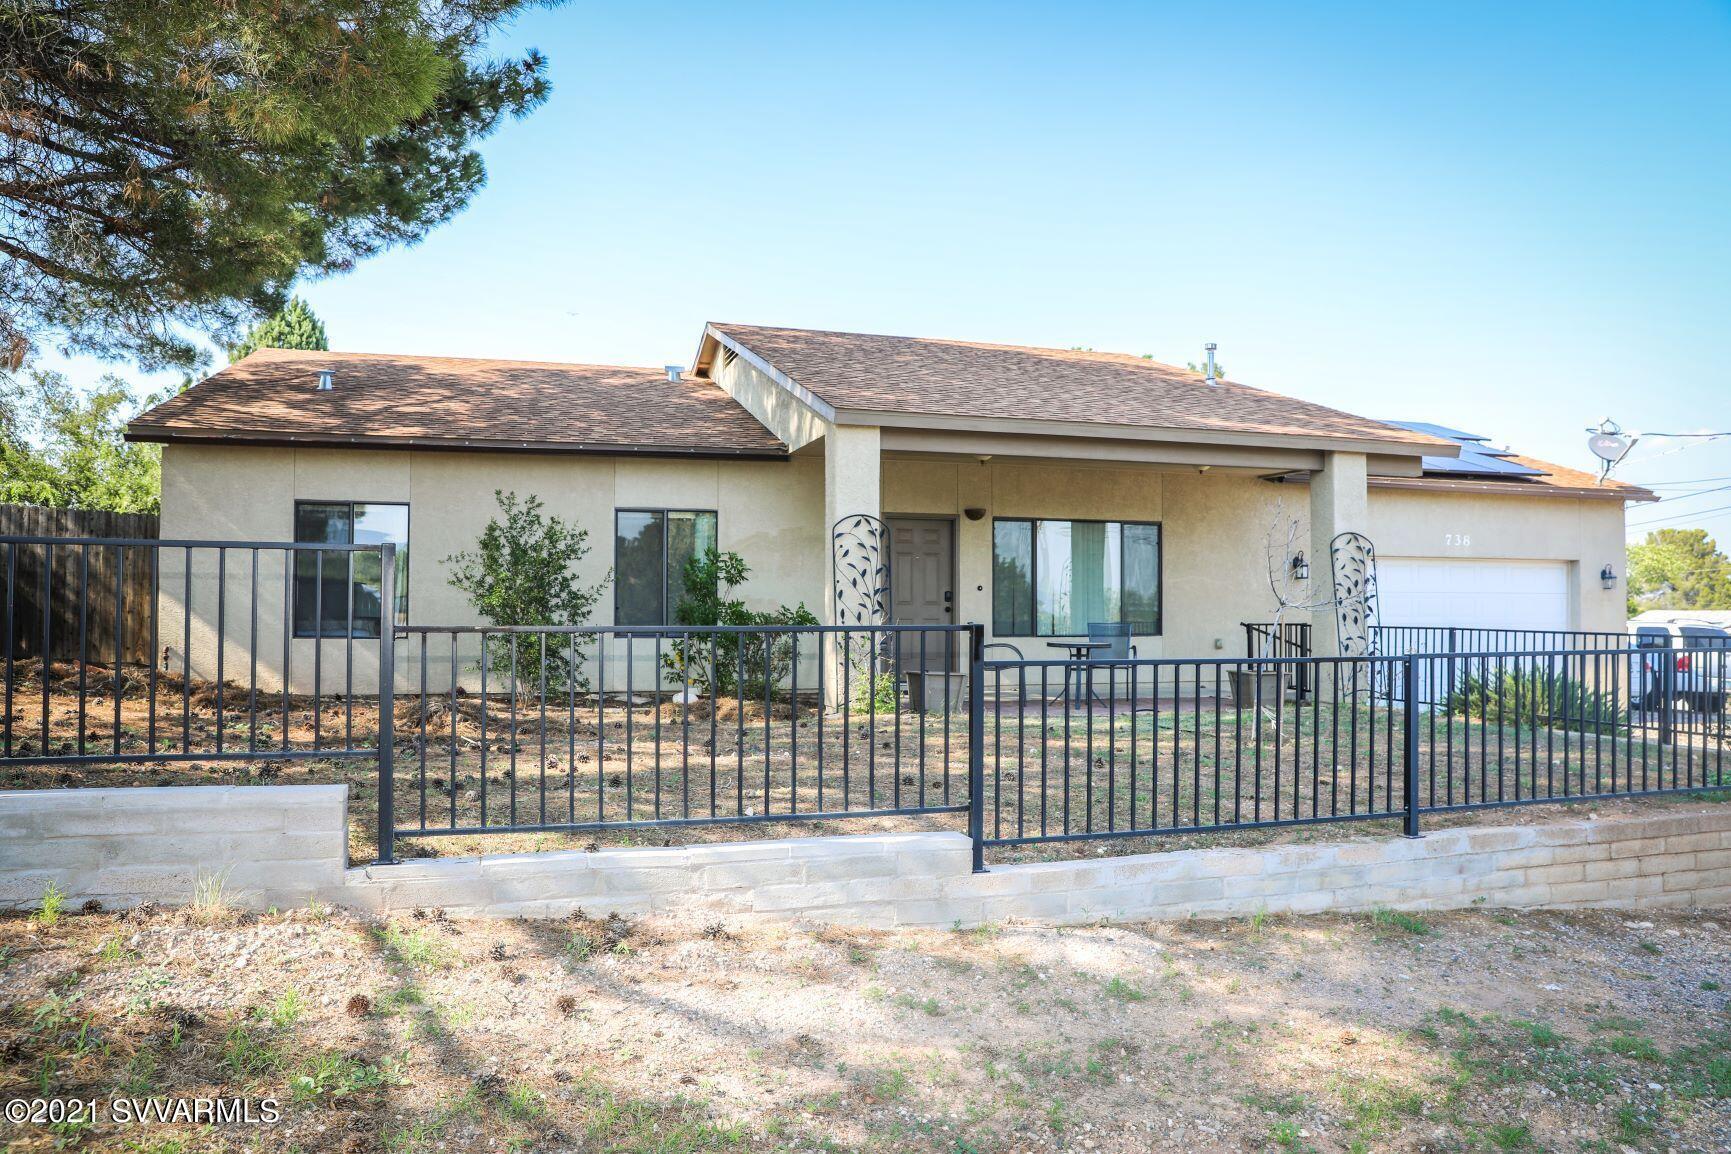 738 E Date St Cottonwood, AZ 86326